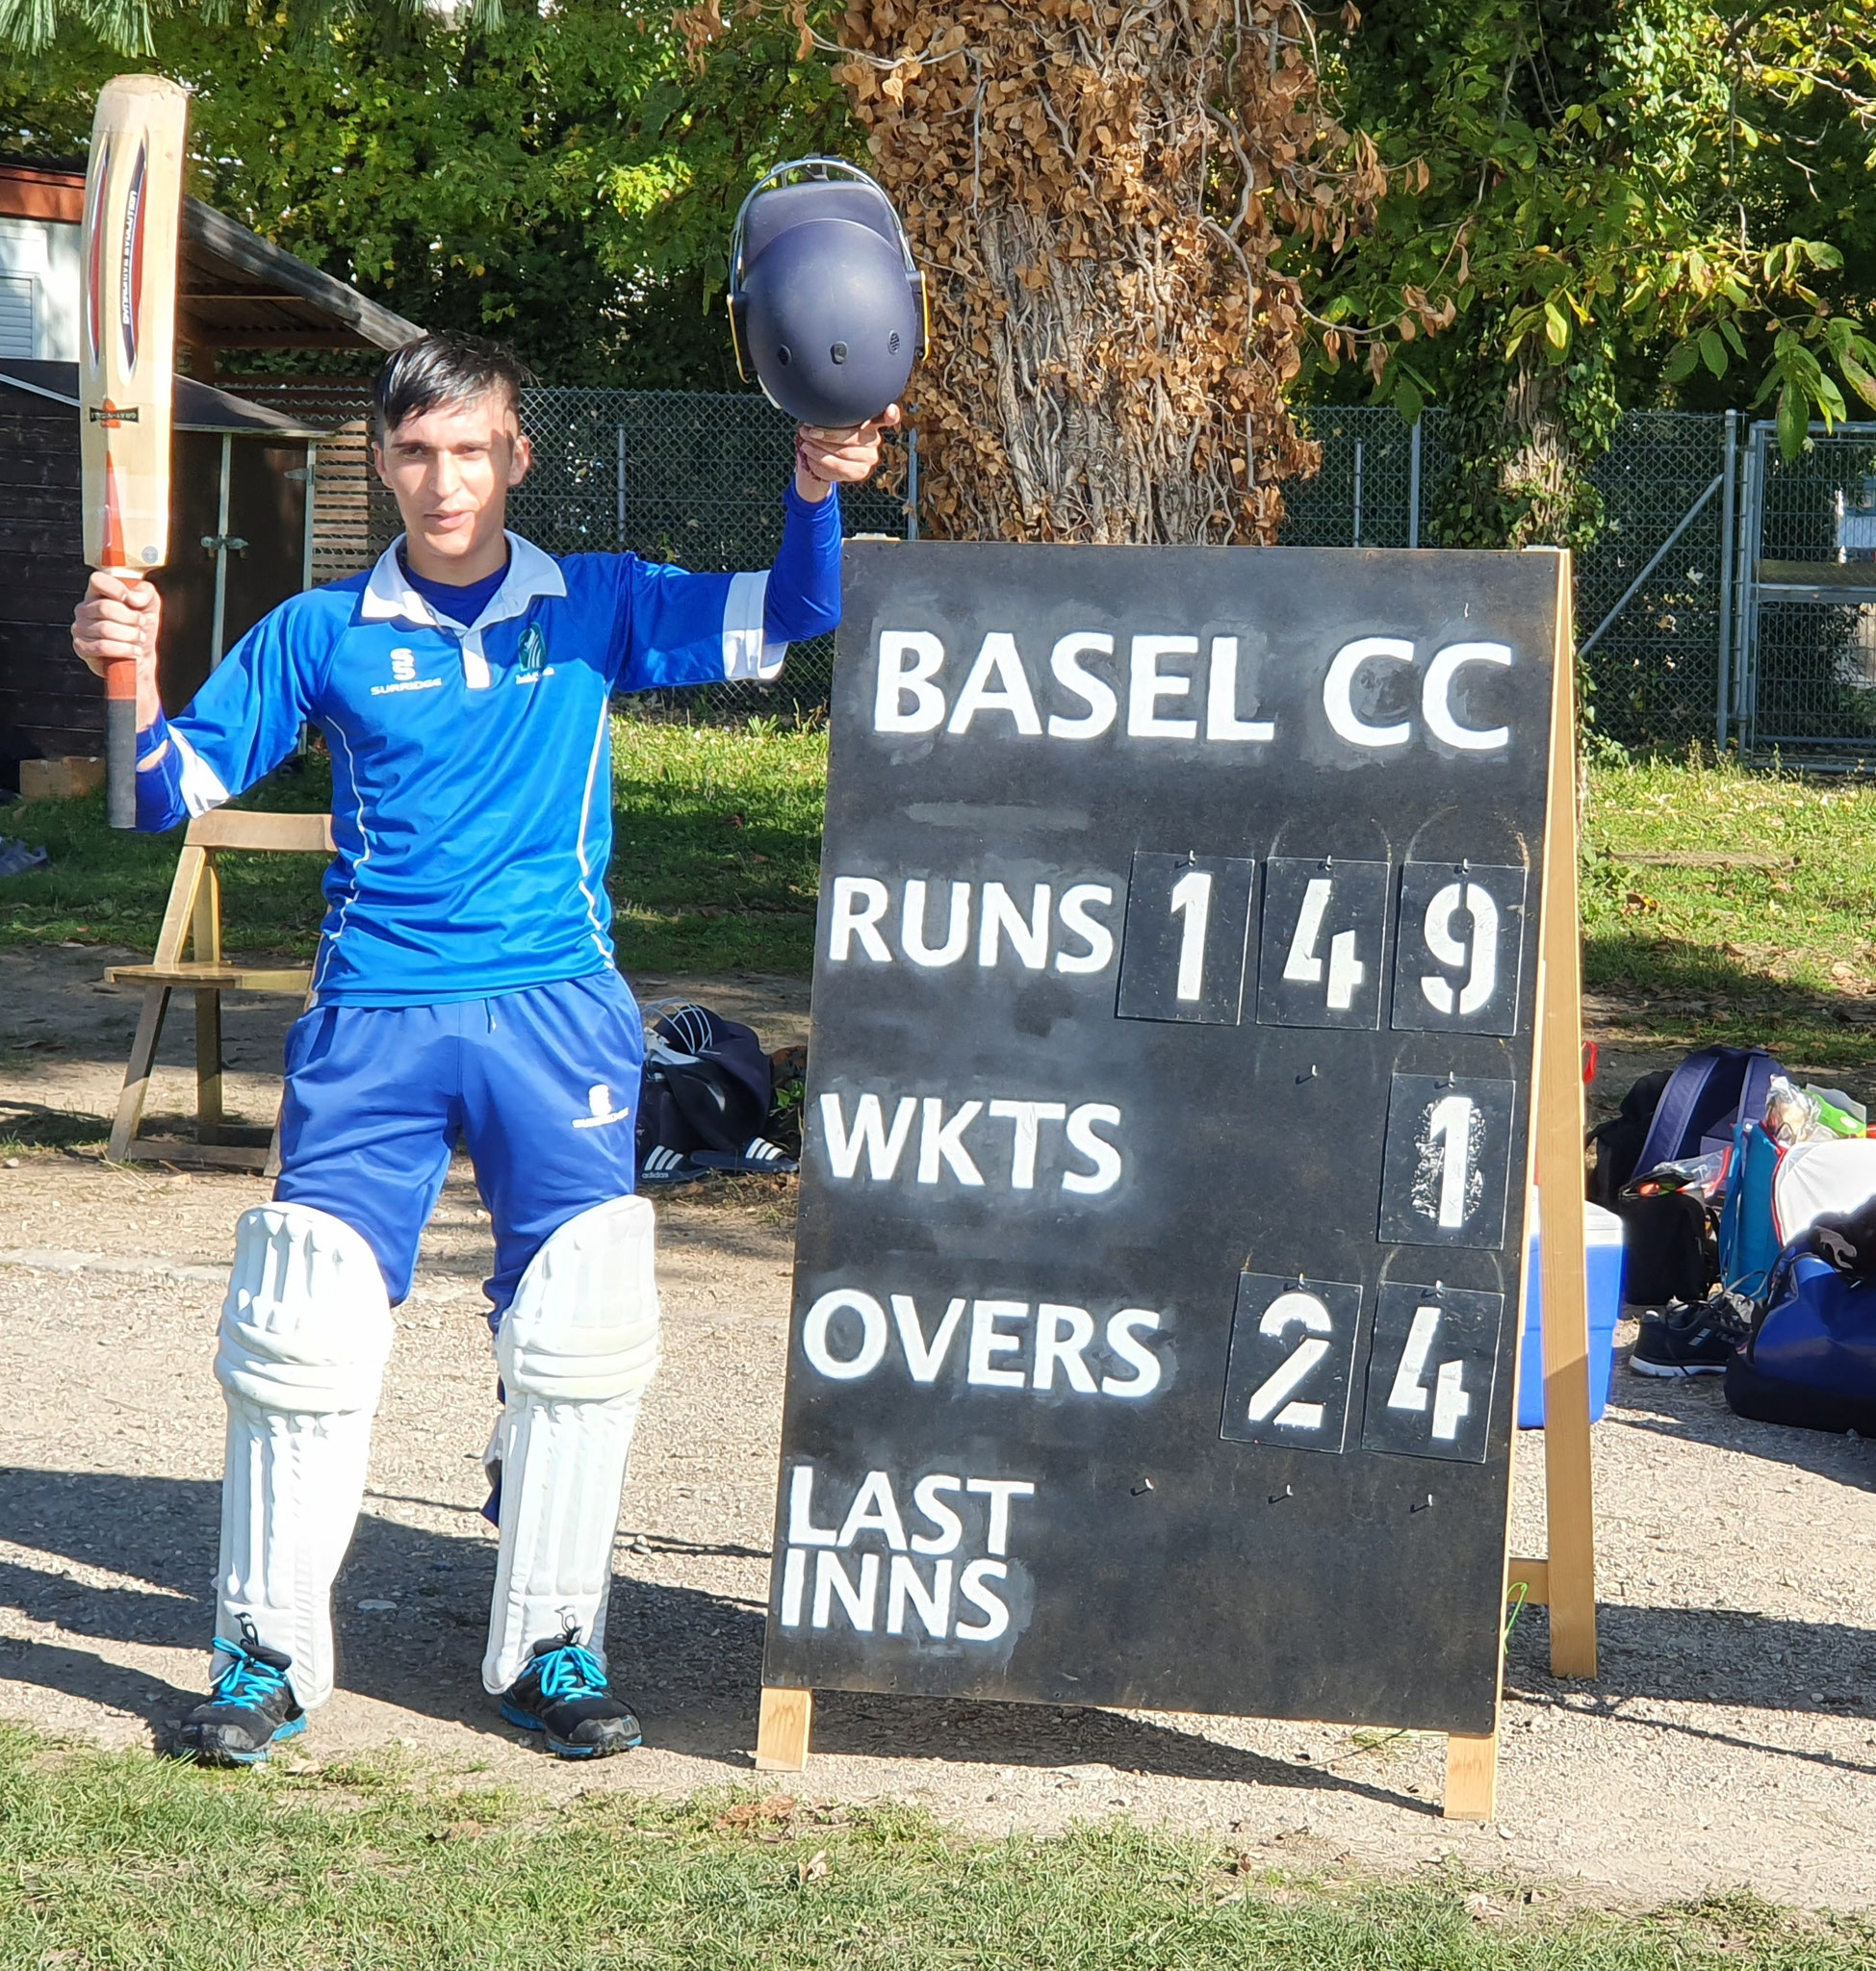 Khalid retired on 108 having faced 83 balls and hit 13 boundaries